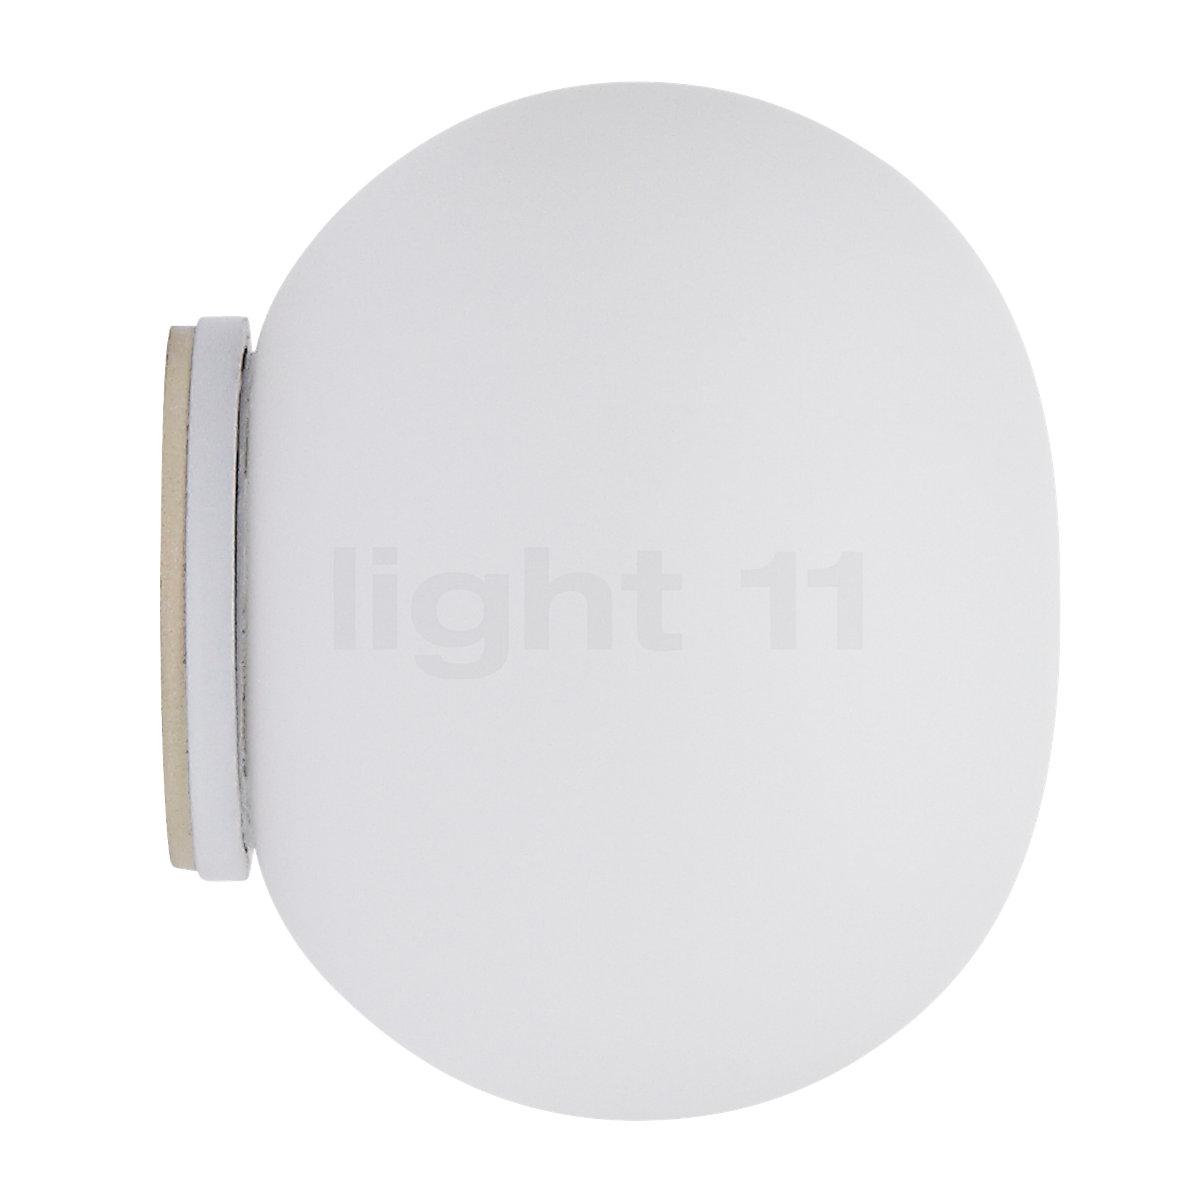 Flos Glo Ball Mini CW IP44